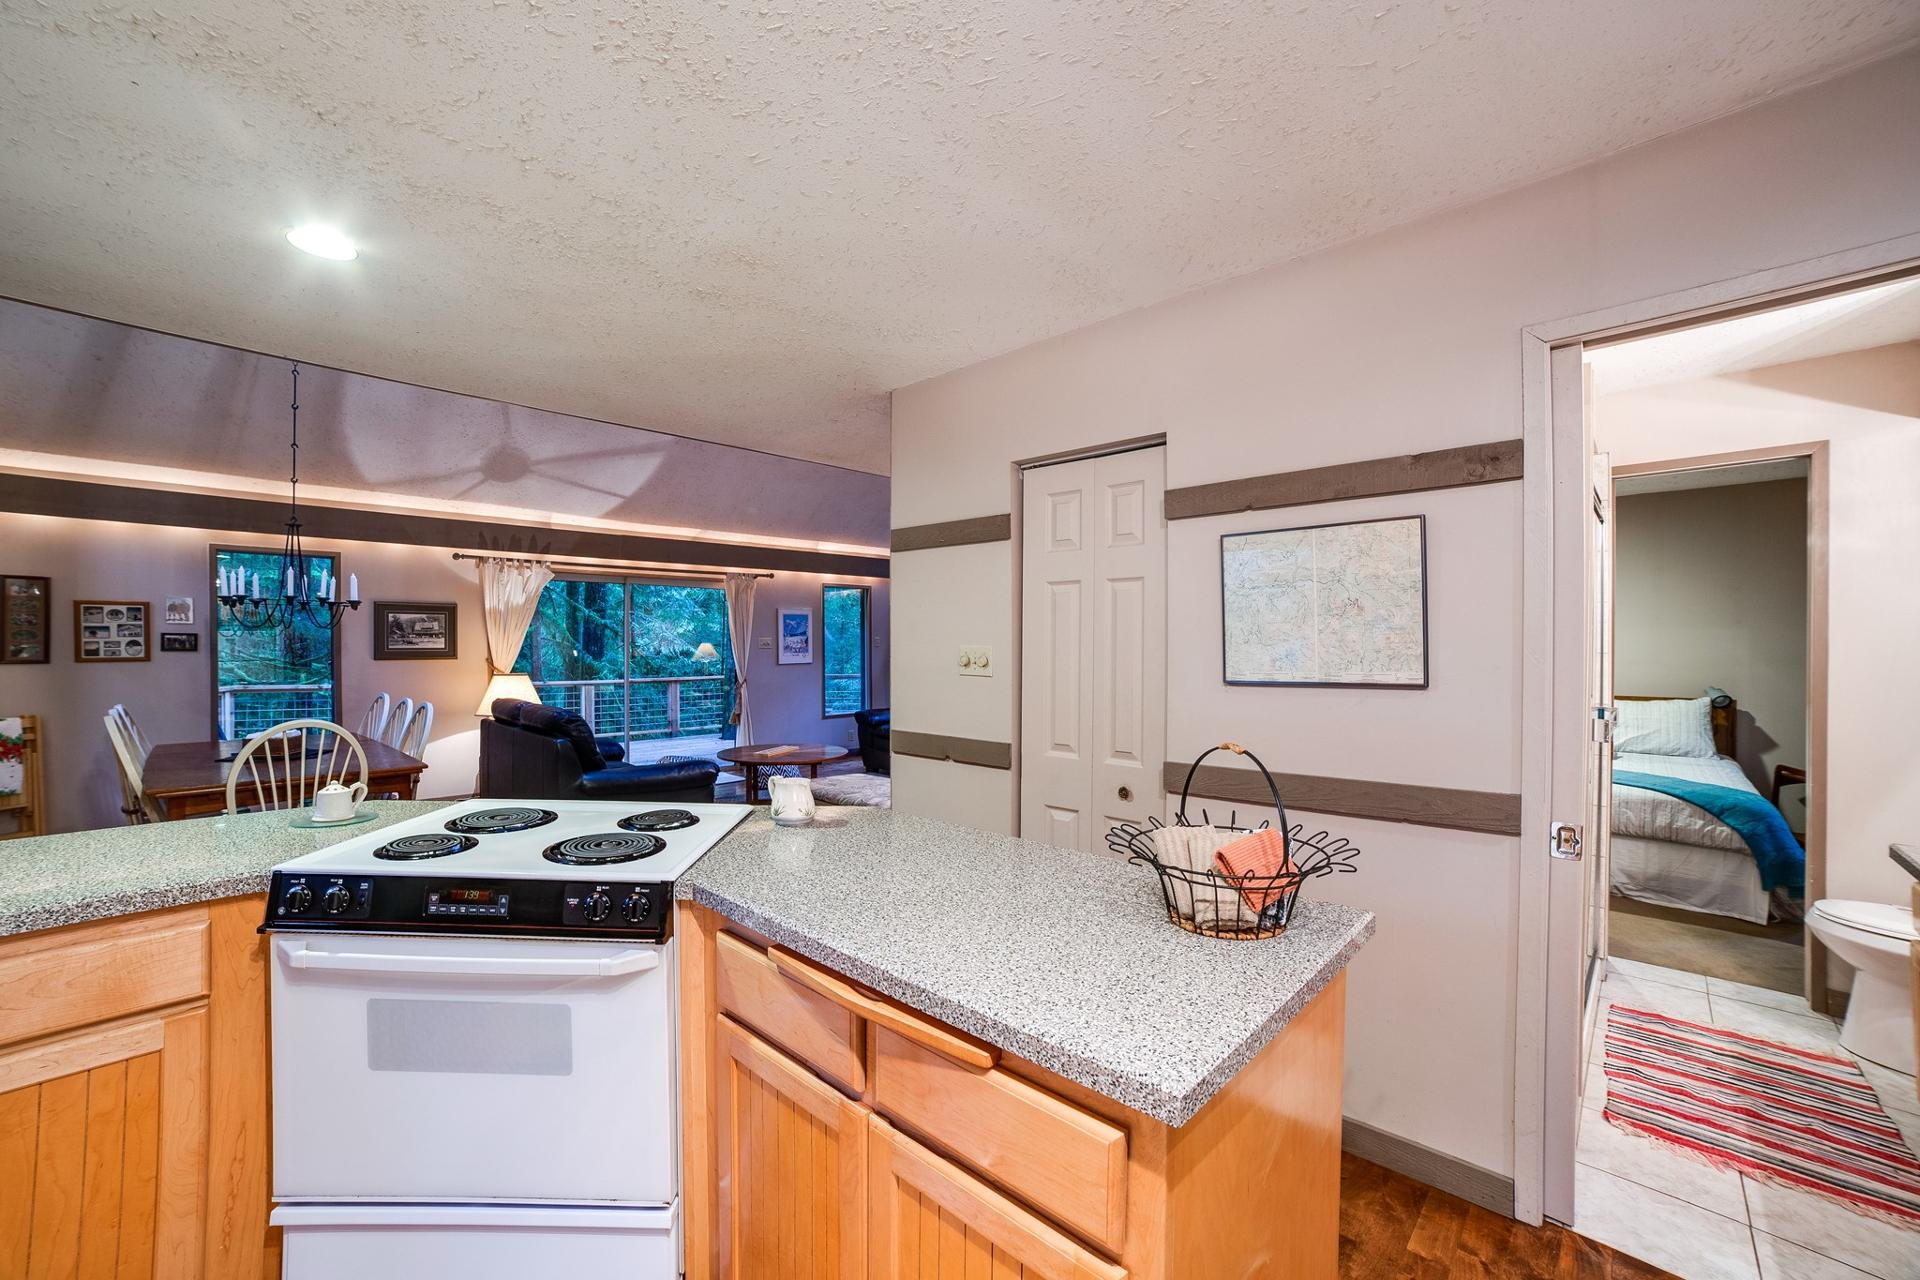 Mt. Baker Lodging Cabin #55 - HOT TUB, WOOD STOVE, BBQ, SLEEPS 10! photo 3999540